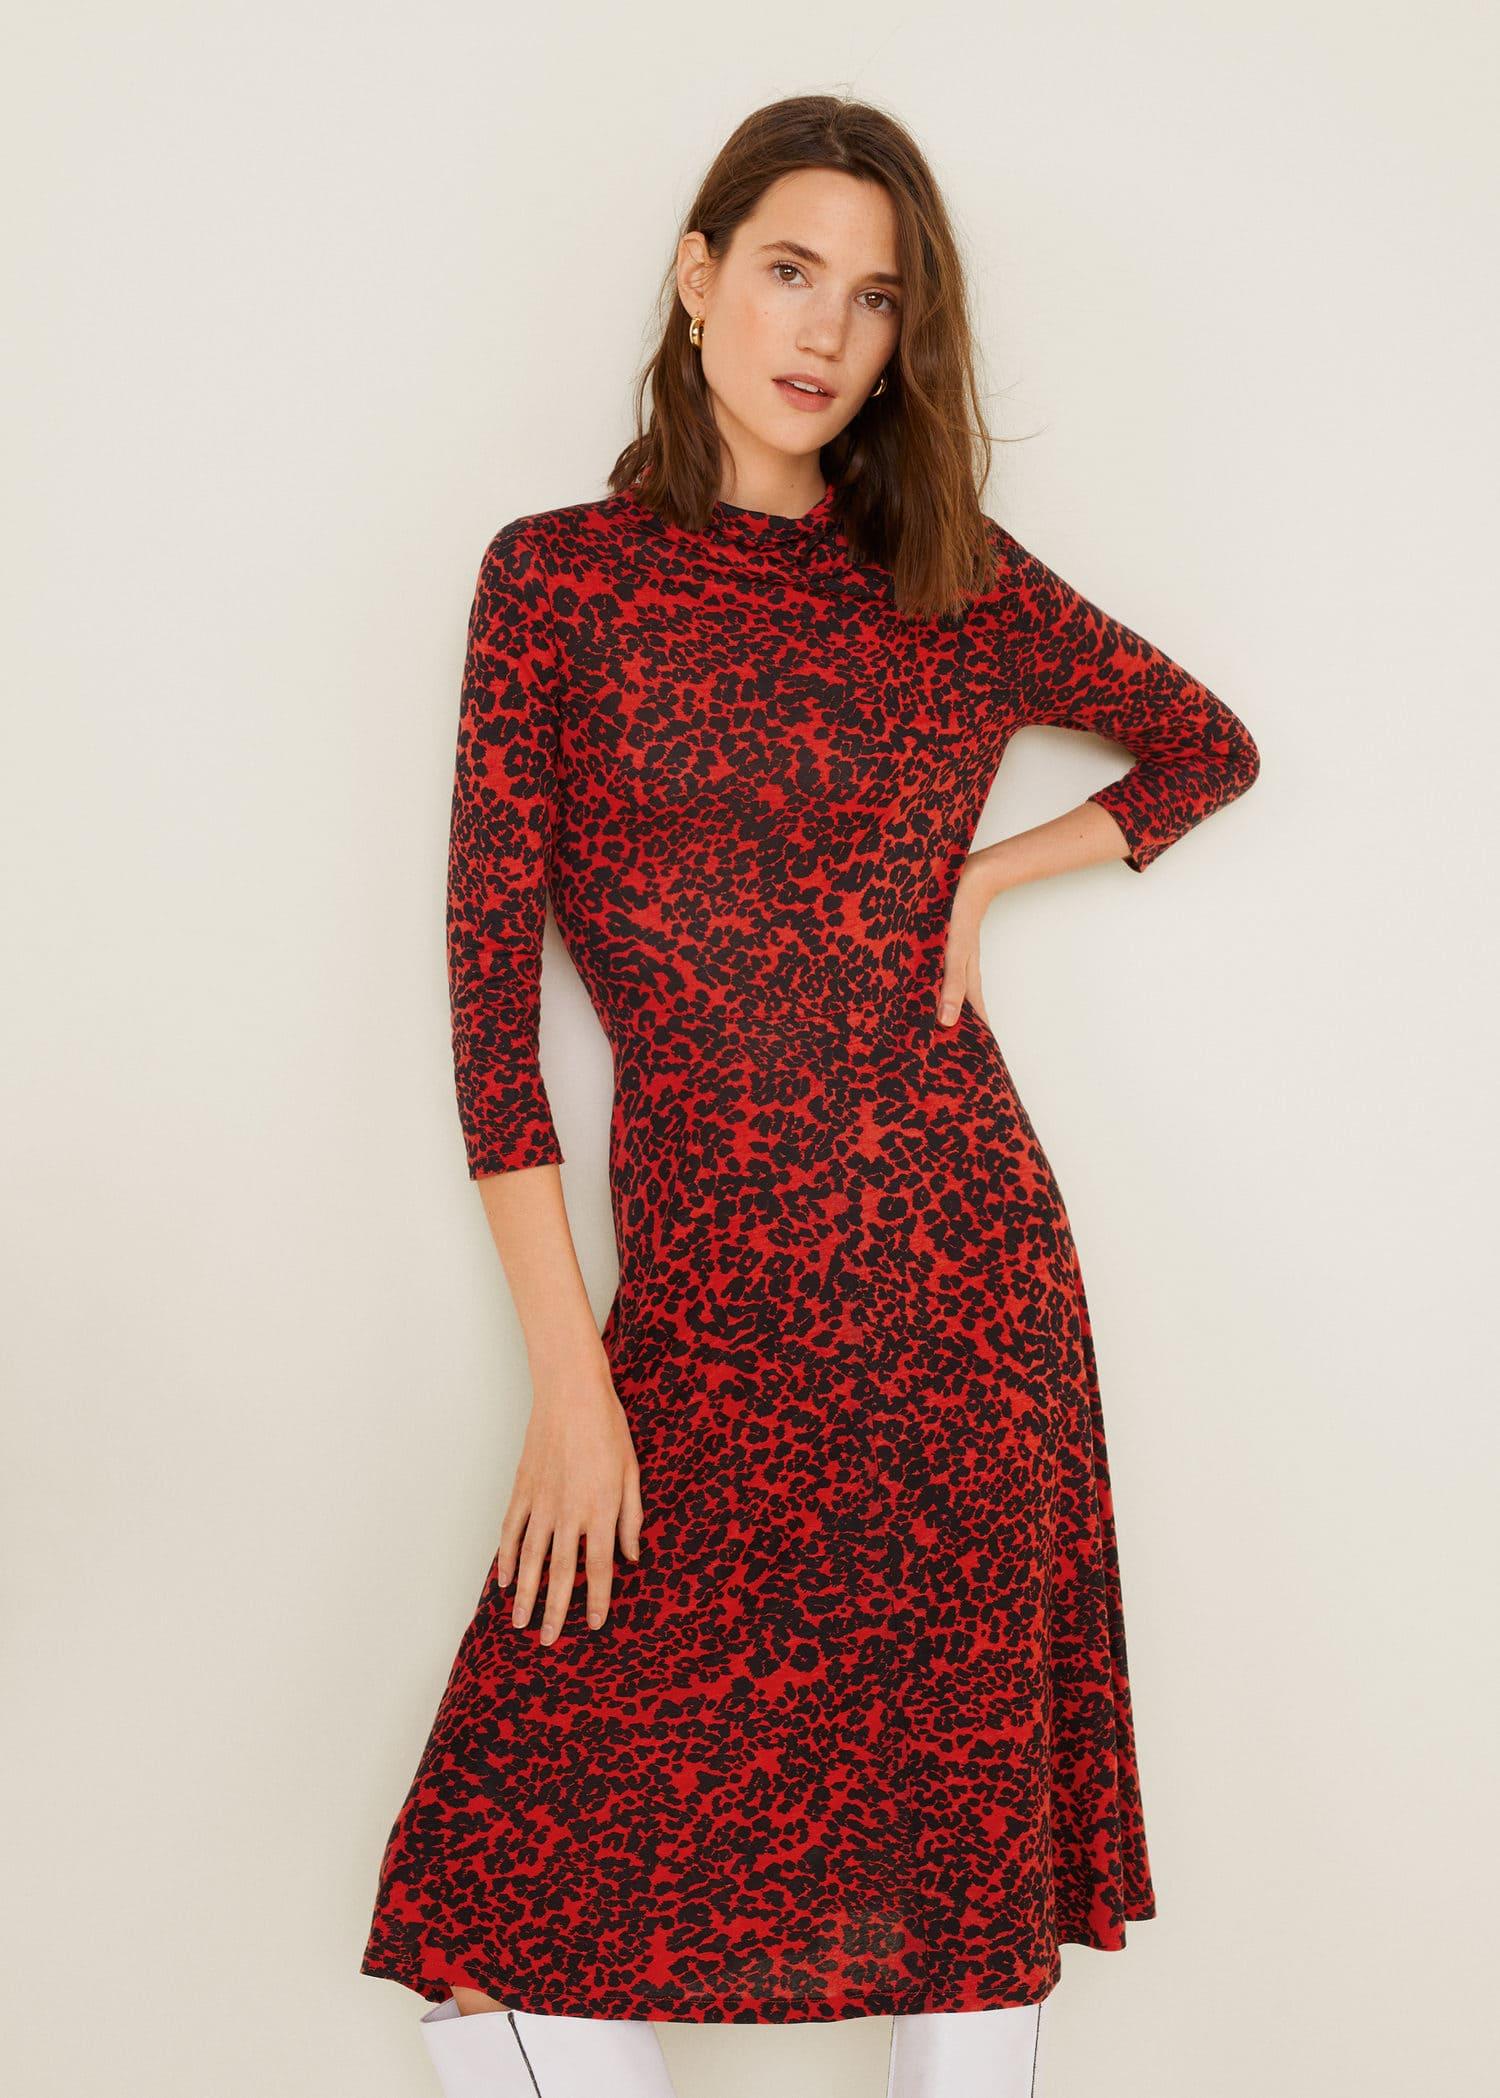 75d8b1a1 Animal print dress - Women | Mango United Kingdom